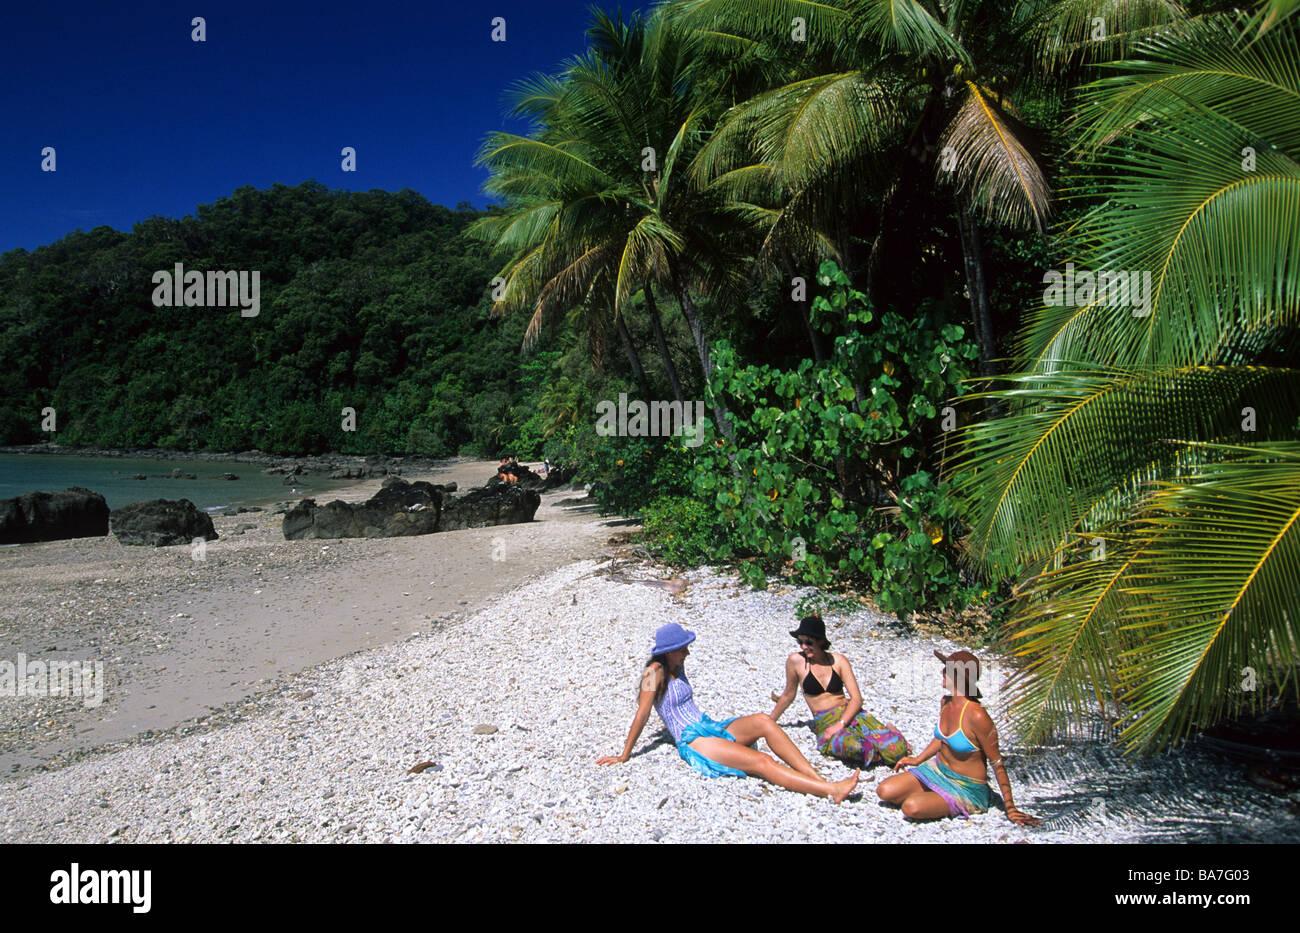 Dunk Island Holidays: Dunk Island Resort Queensland Australia Stock Photos